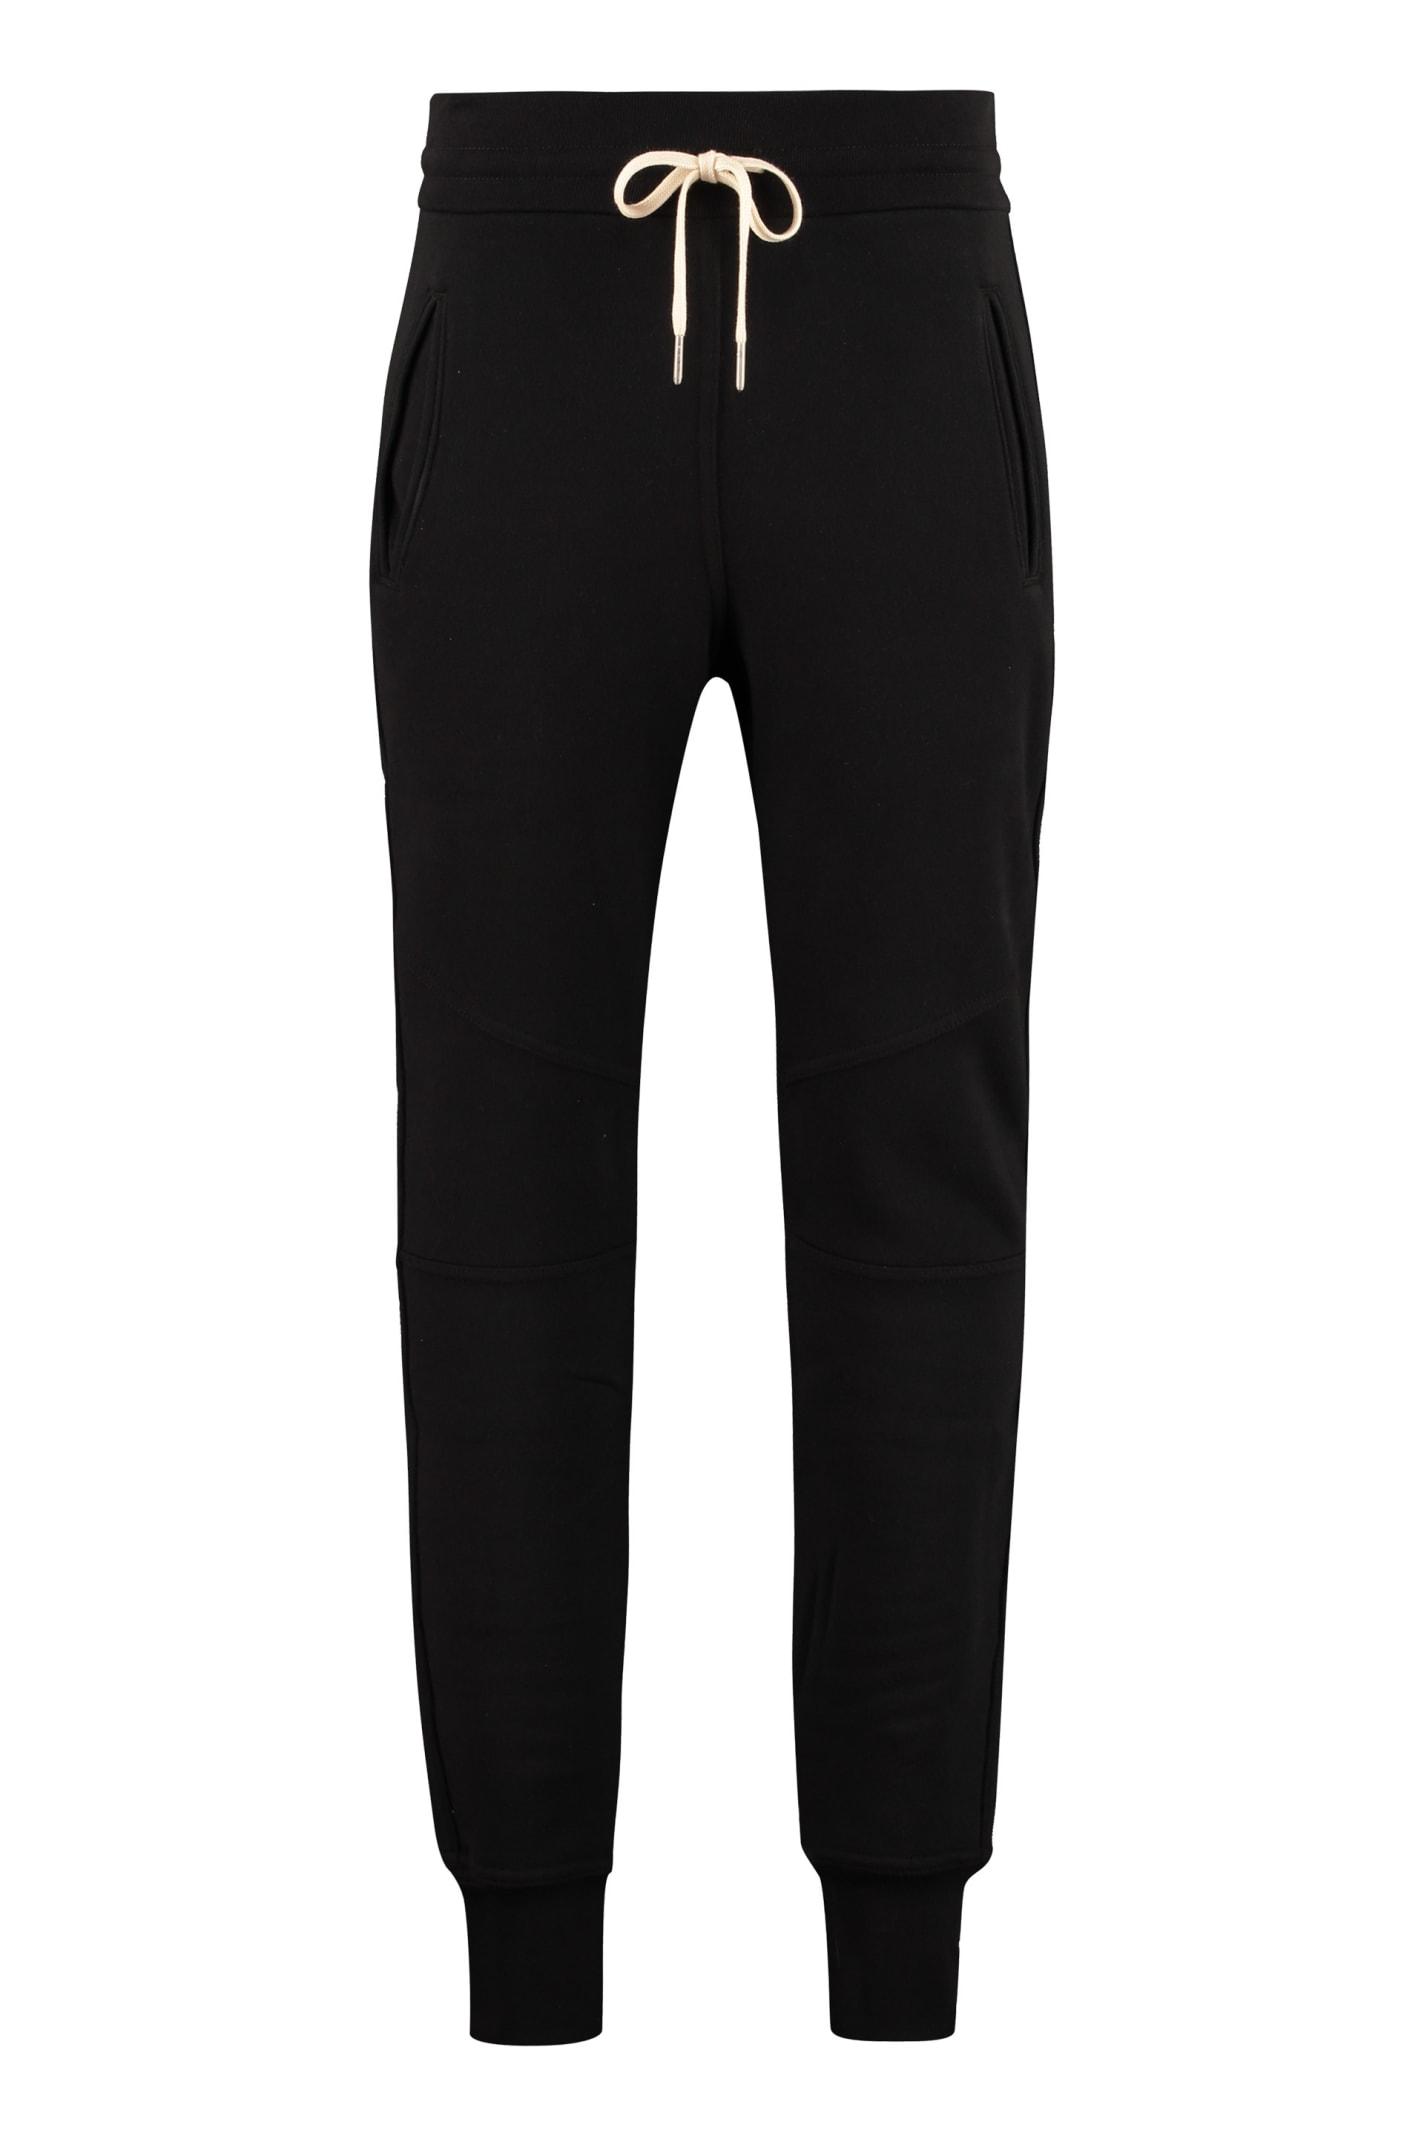 John Elliott Cotton Sweatpants